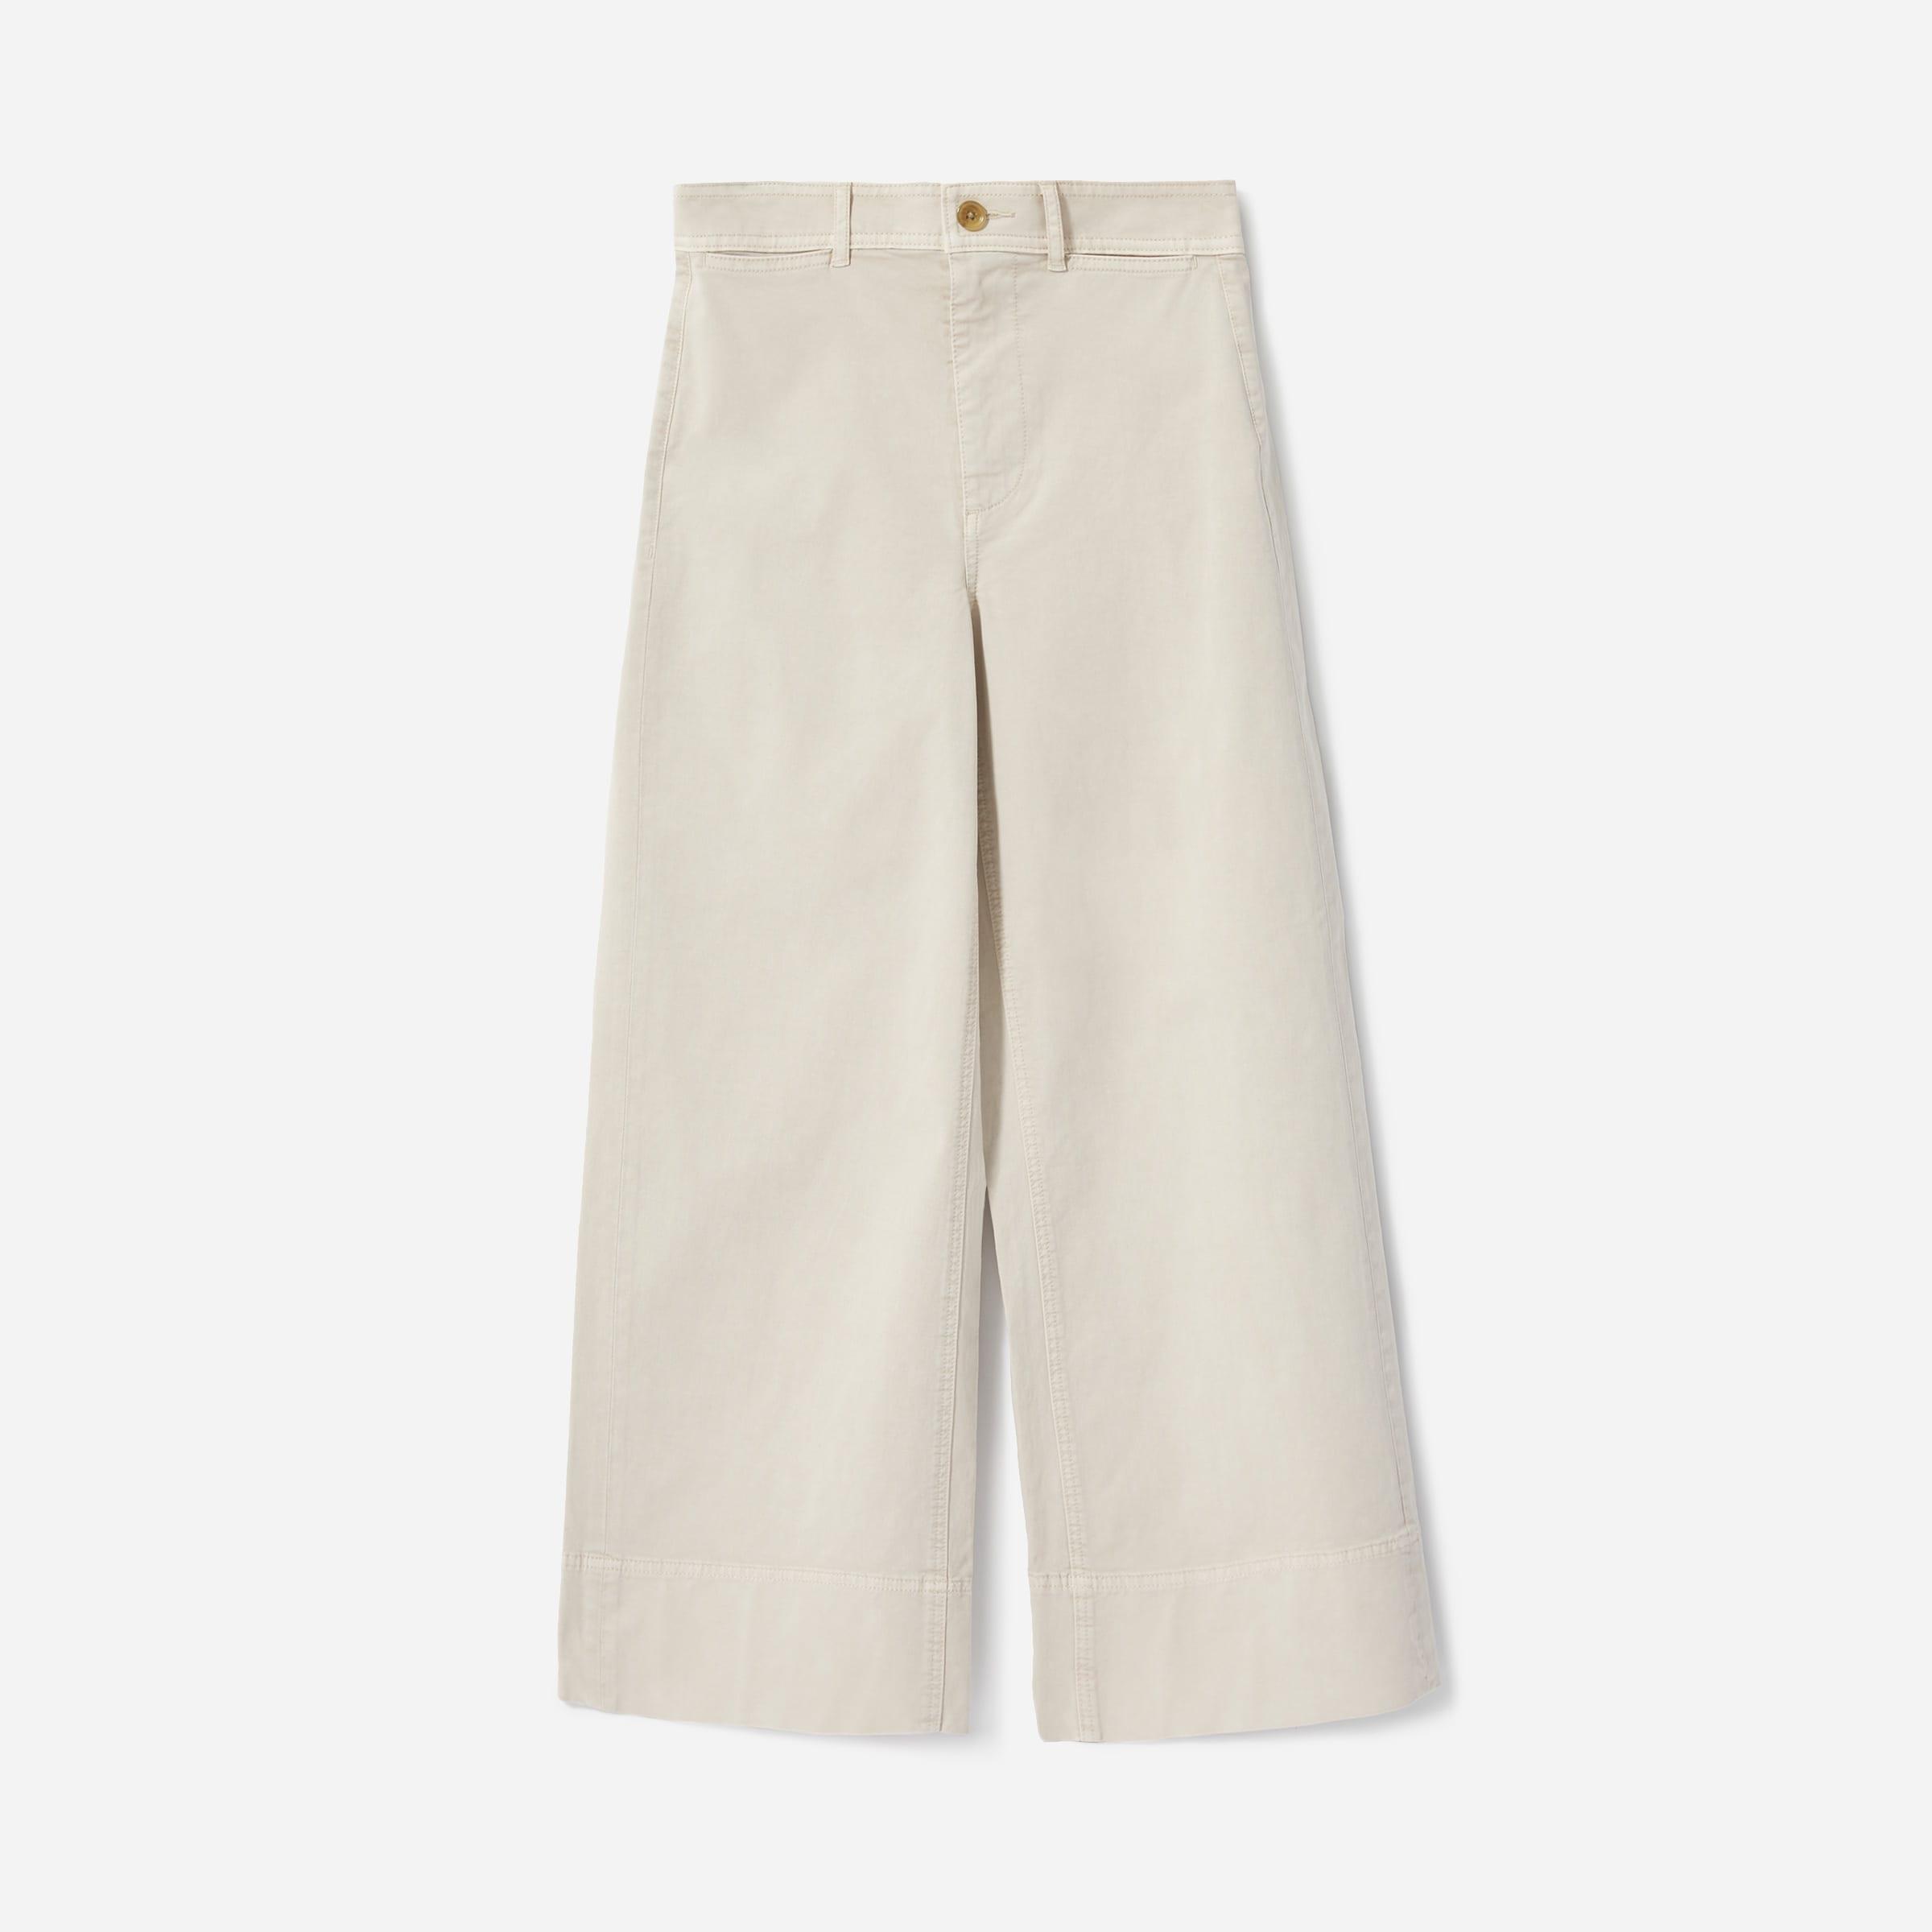 The Lightweight Wide Leg Crop Chino —$72 | Everlane